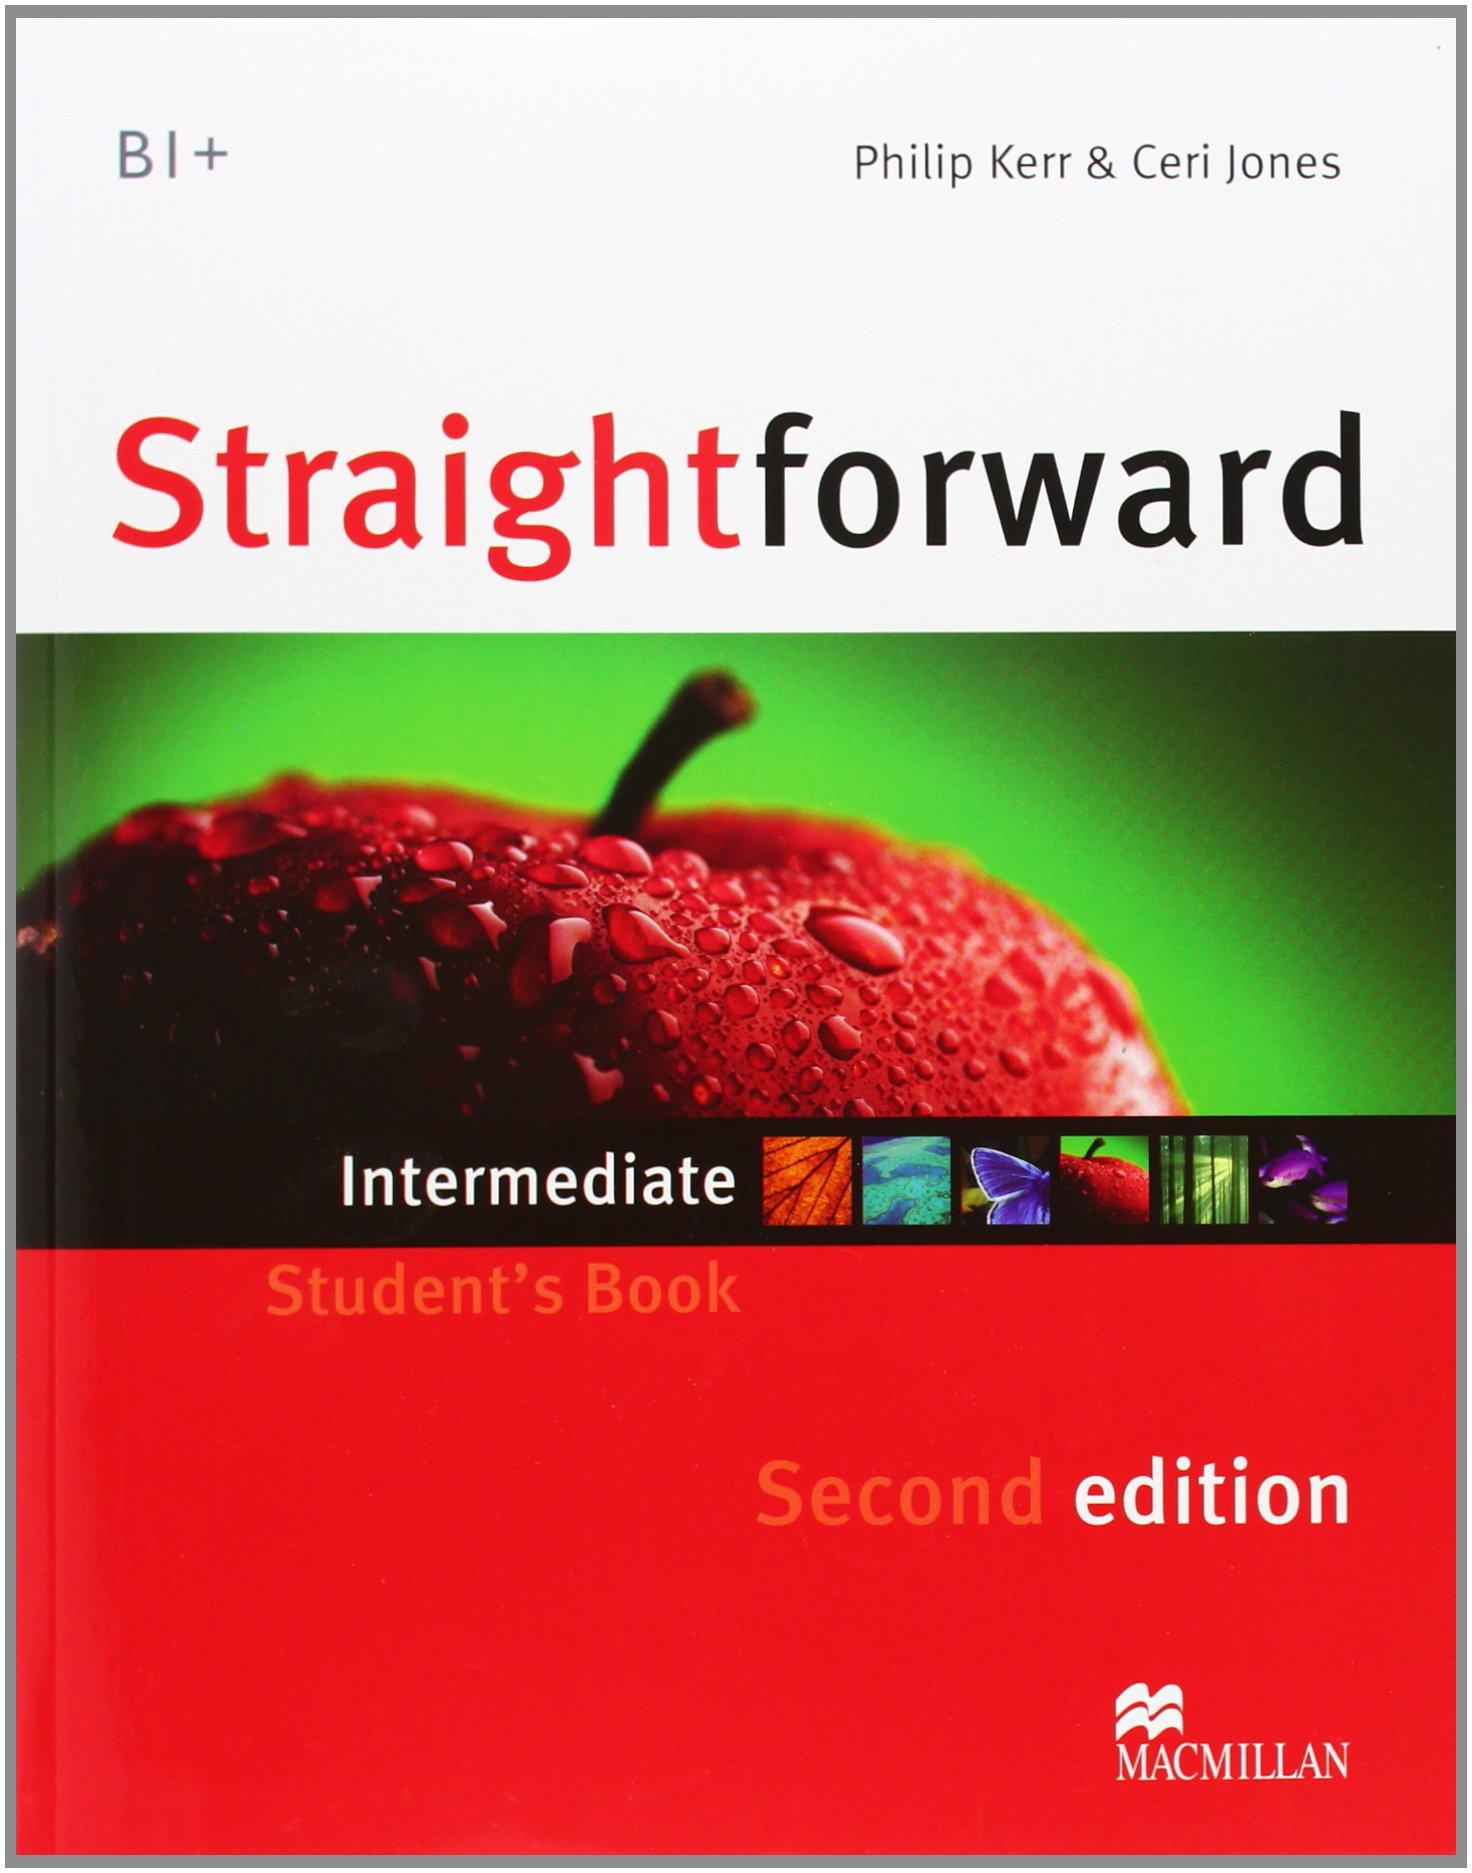 Straightforward intermediate скачать бесплатно pdf